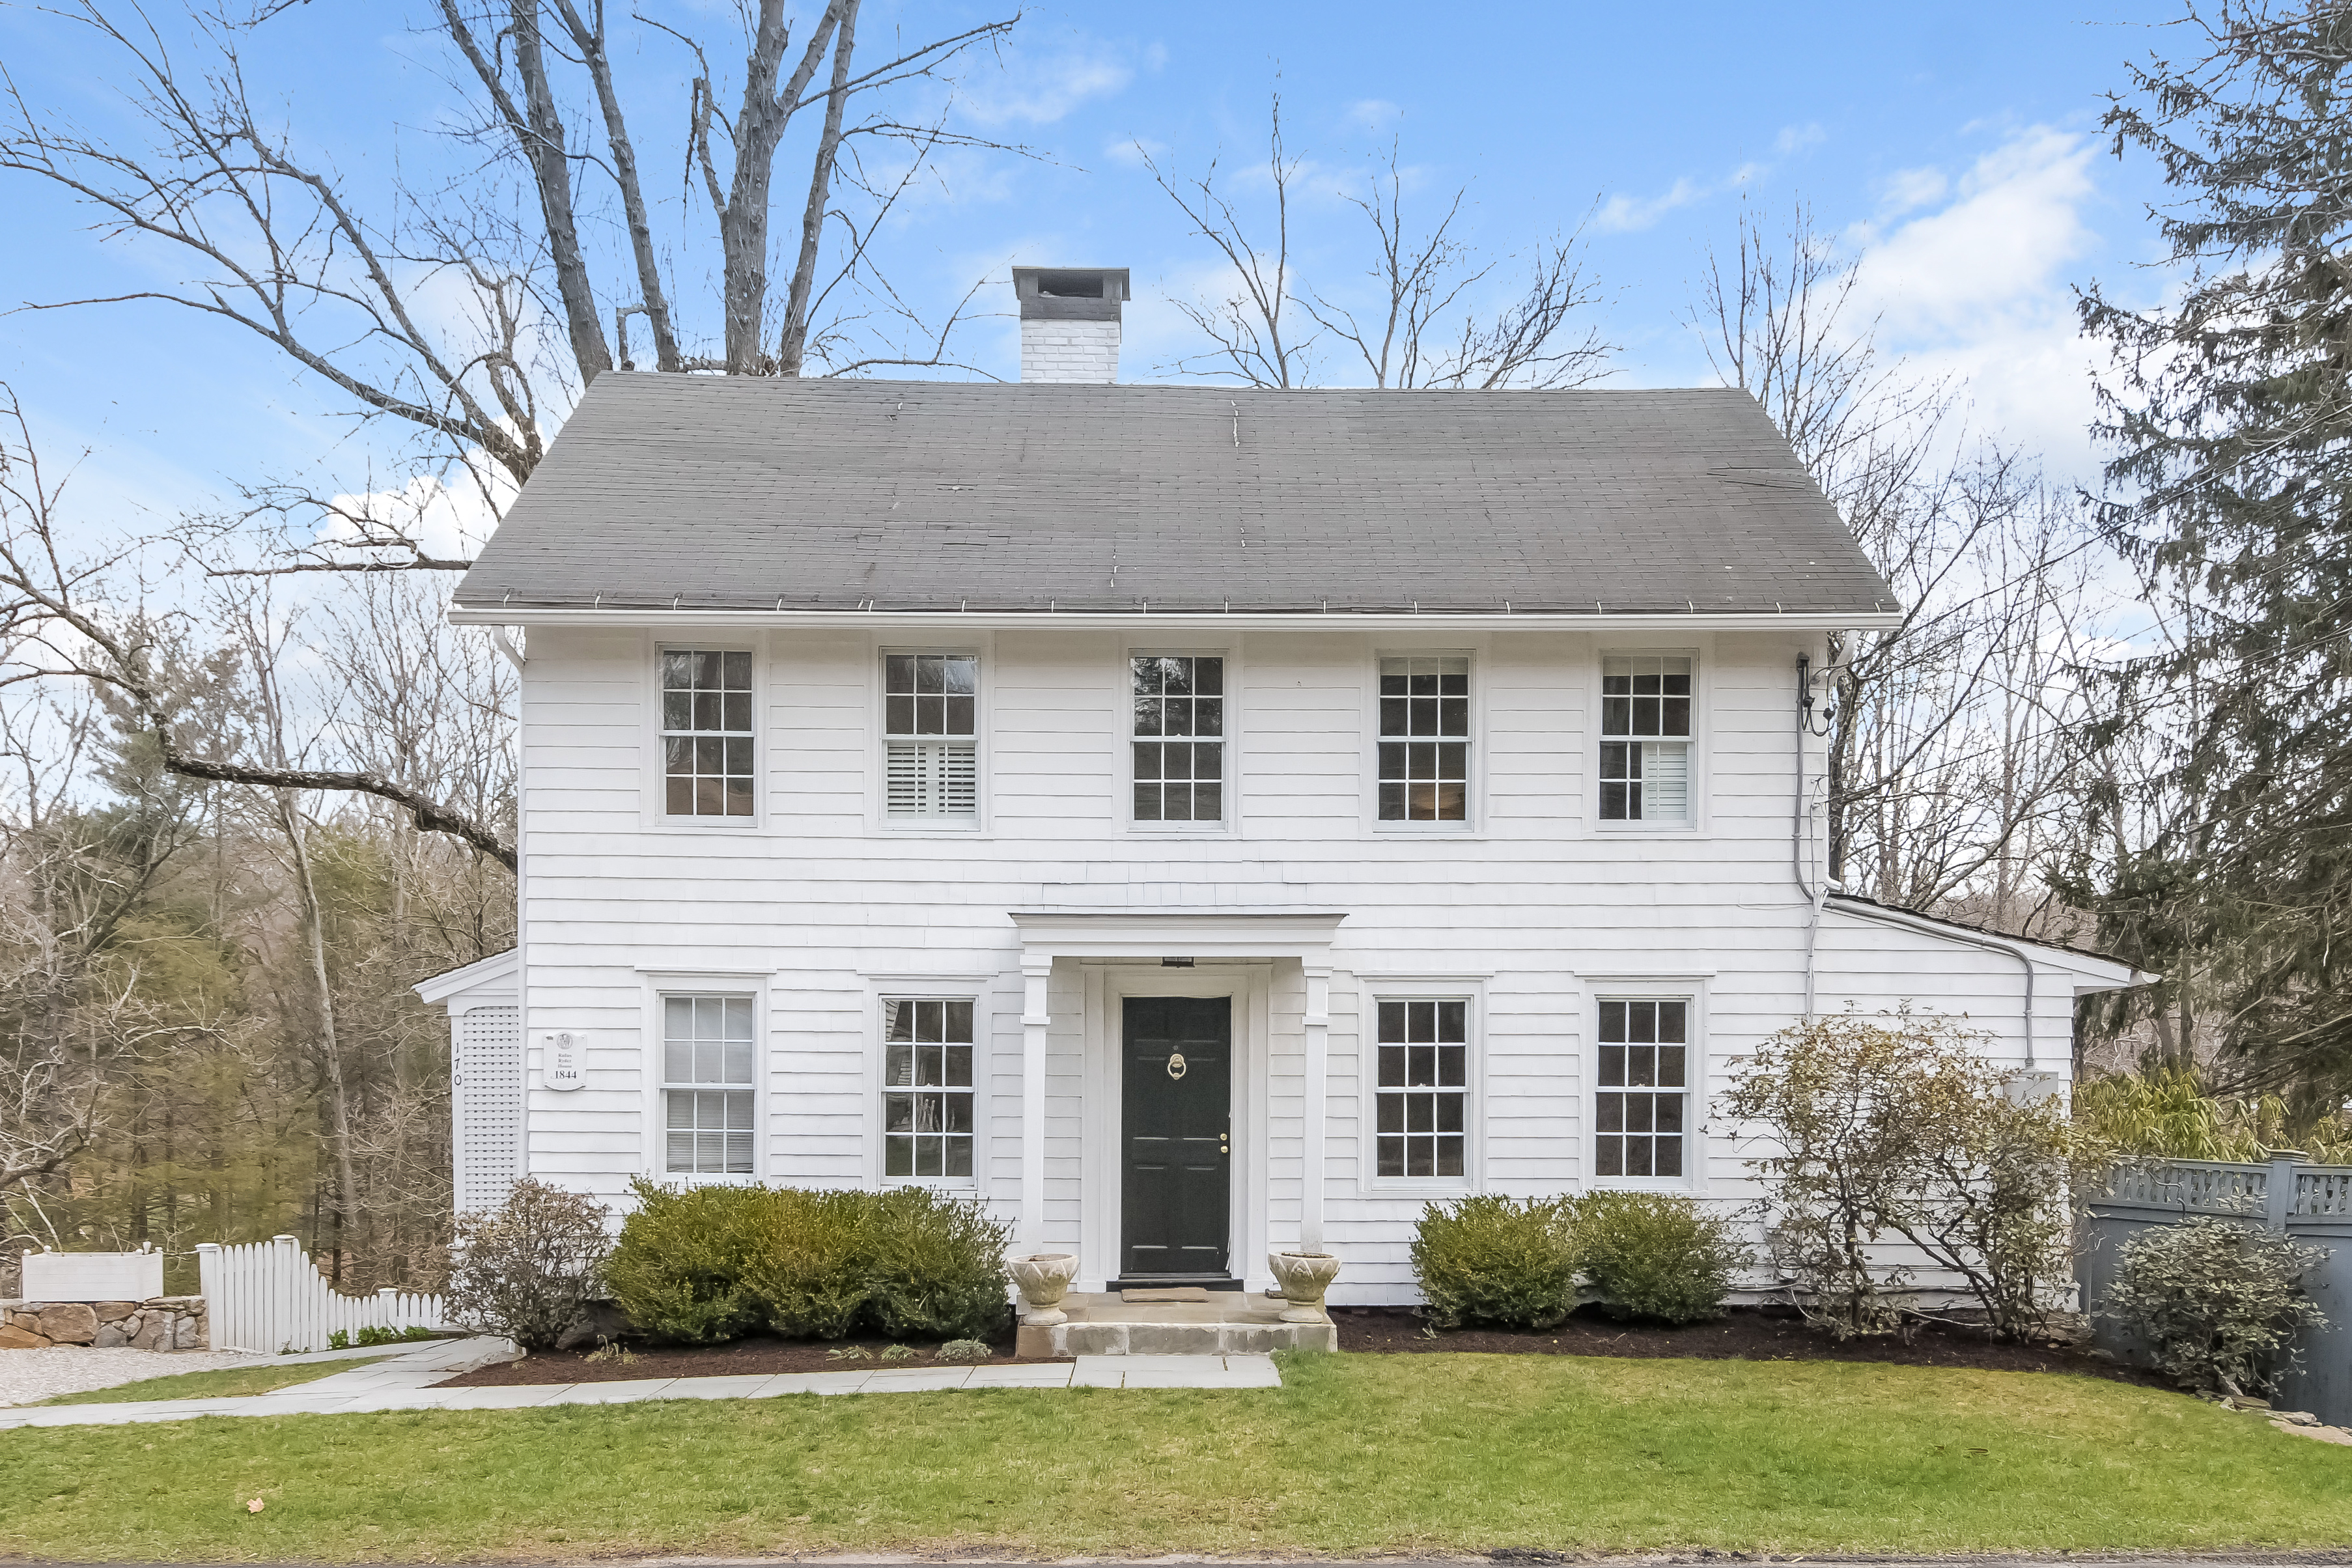 Moradia para Venda às Rufus Rider House 170 Silvermine Avenue Silvermine, Norwalk, Connecticut, 06850 Estados Unidos